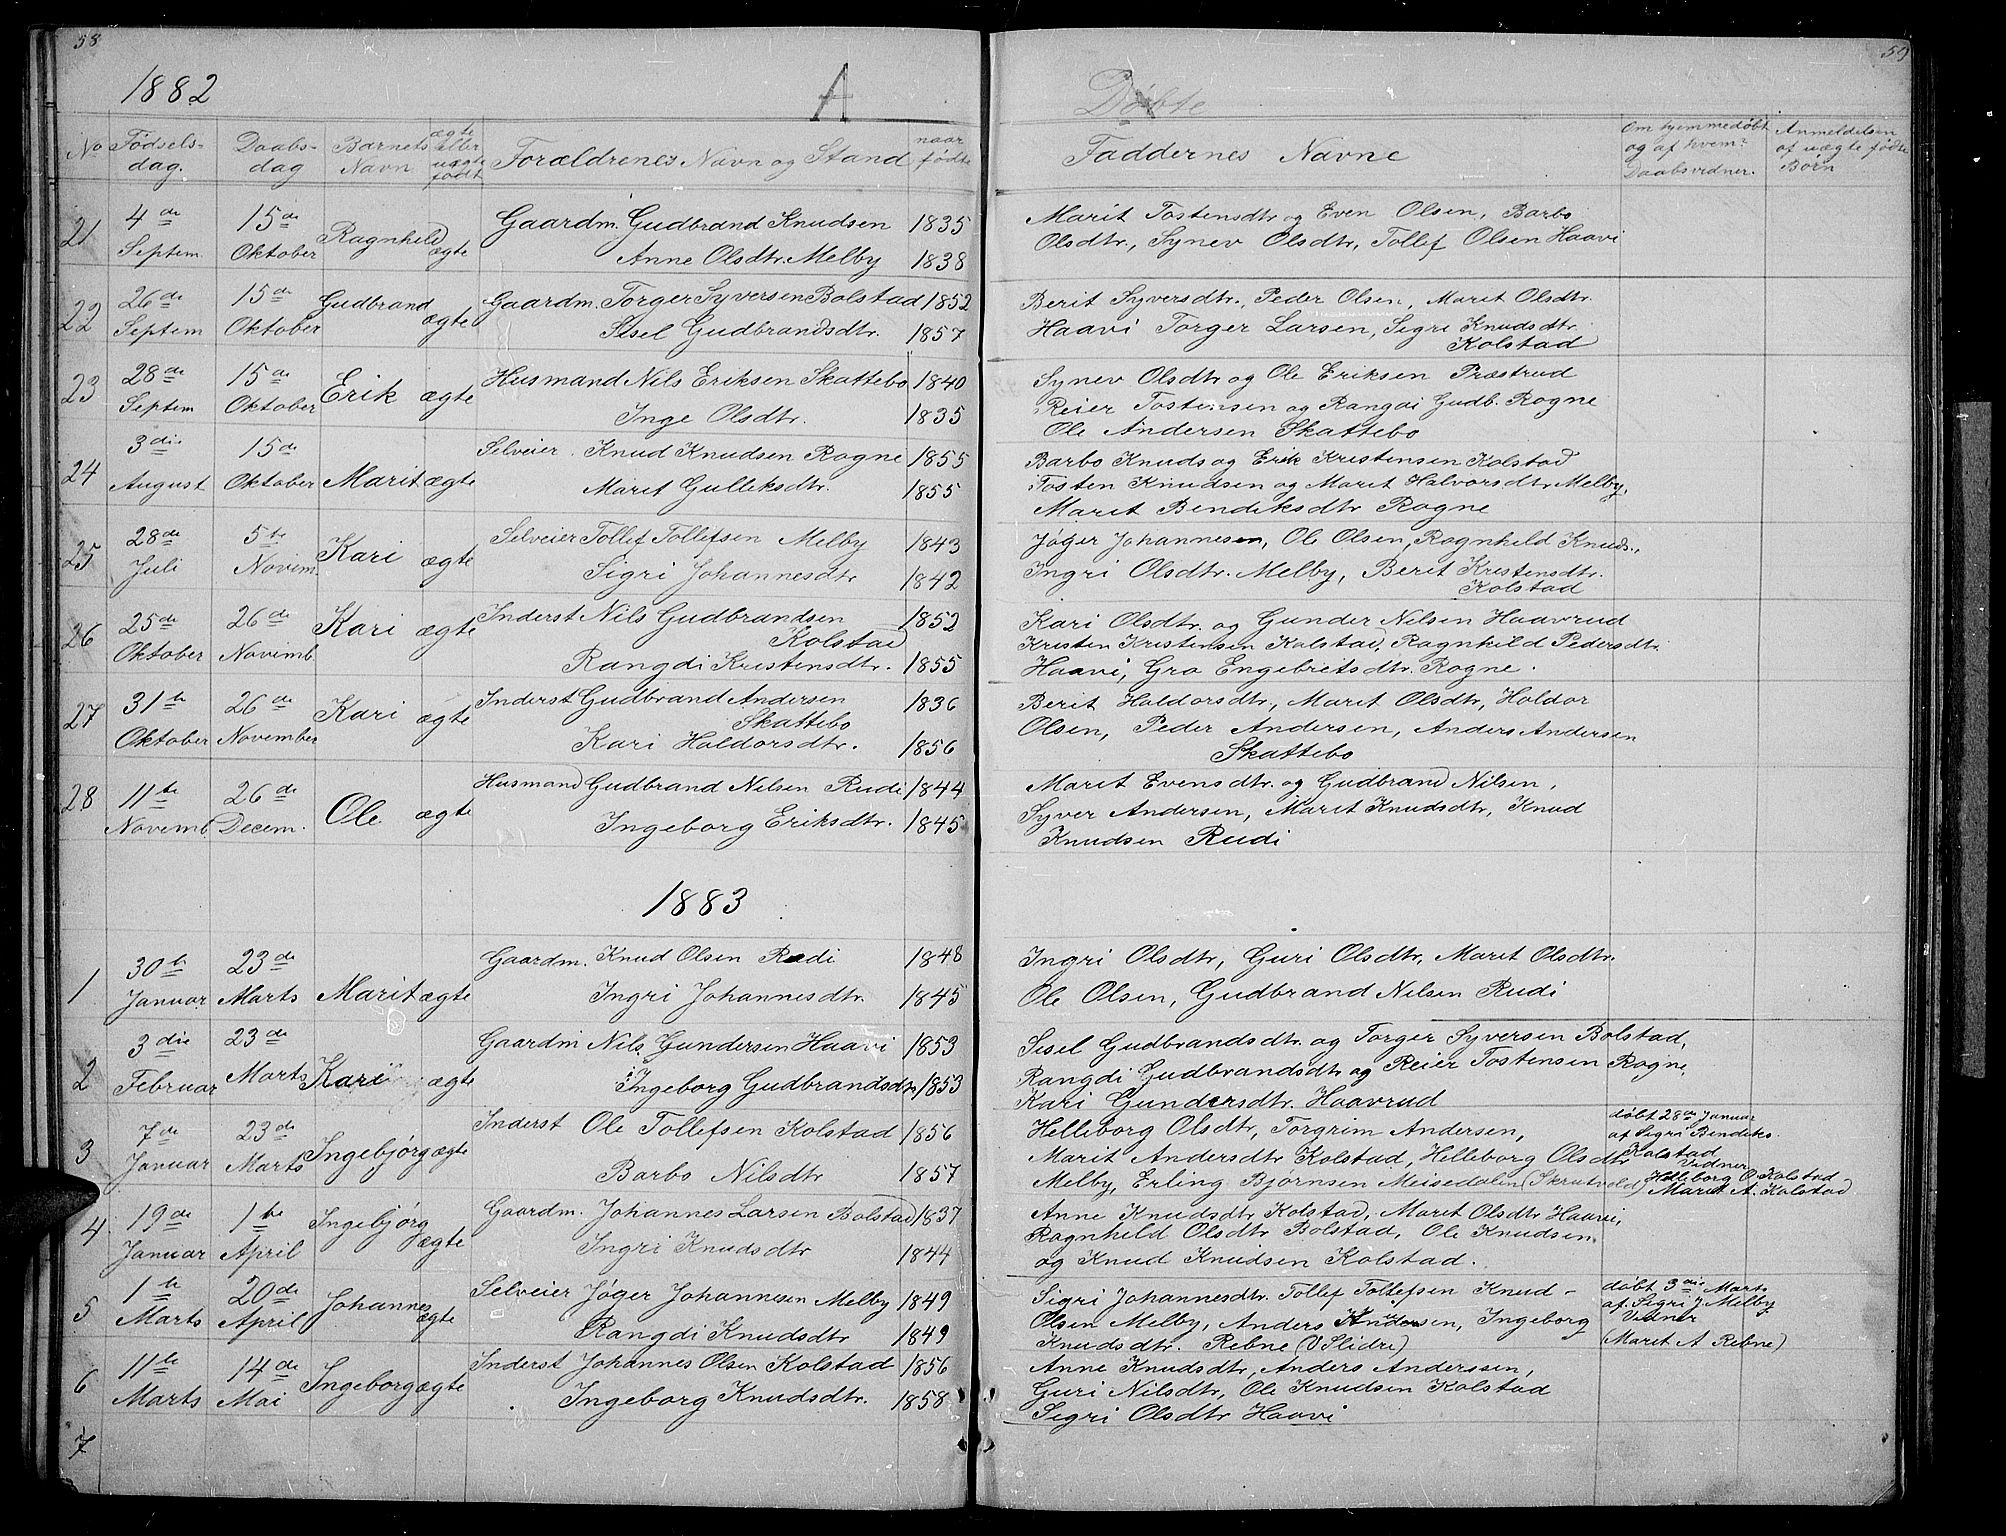 SAH, Øystre Slidre prestekontor, Klokkerbok nr. 3, 1866-1886, s. 58-59